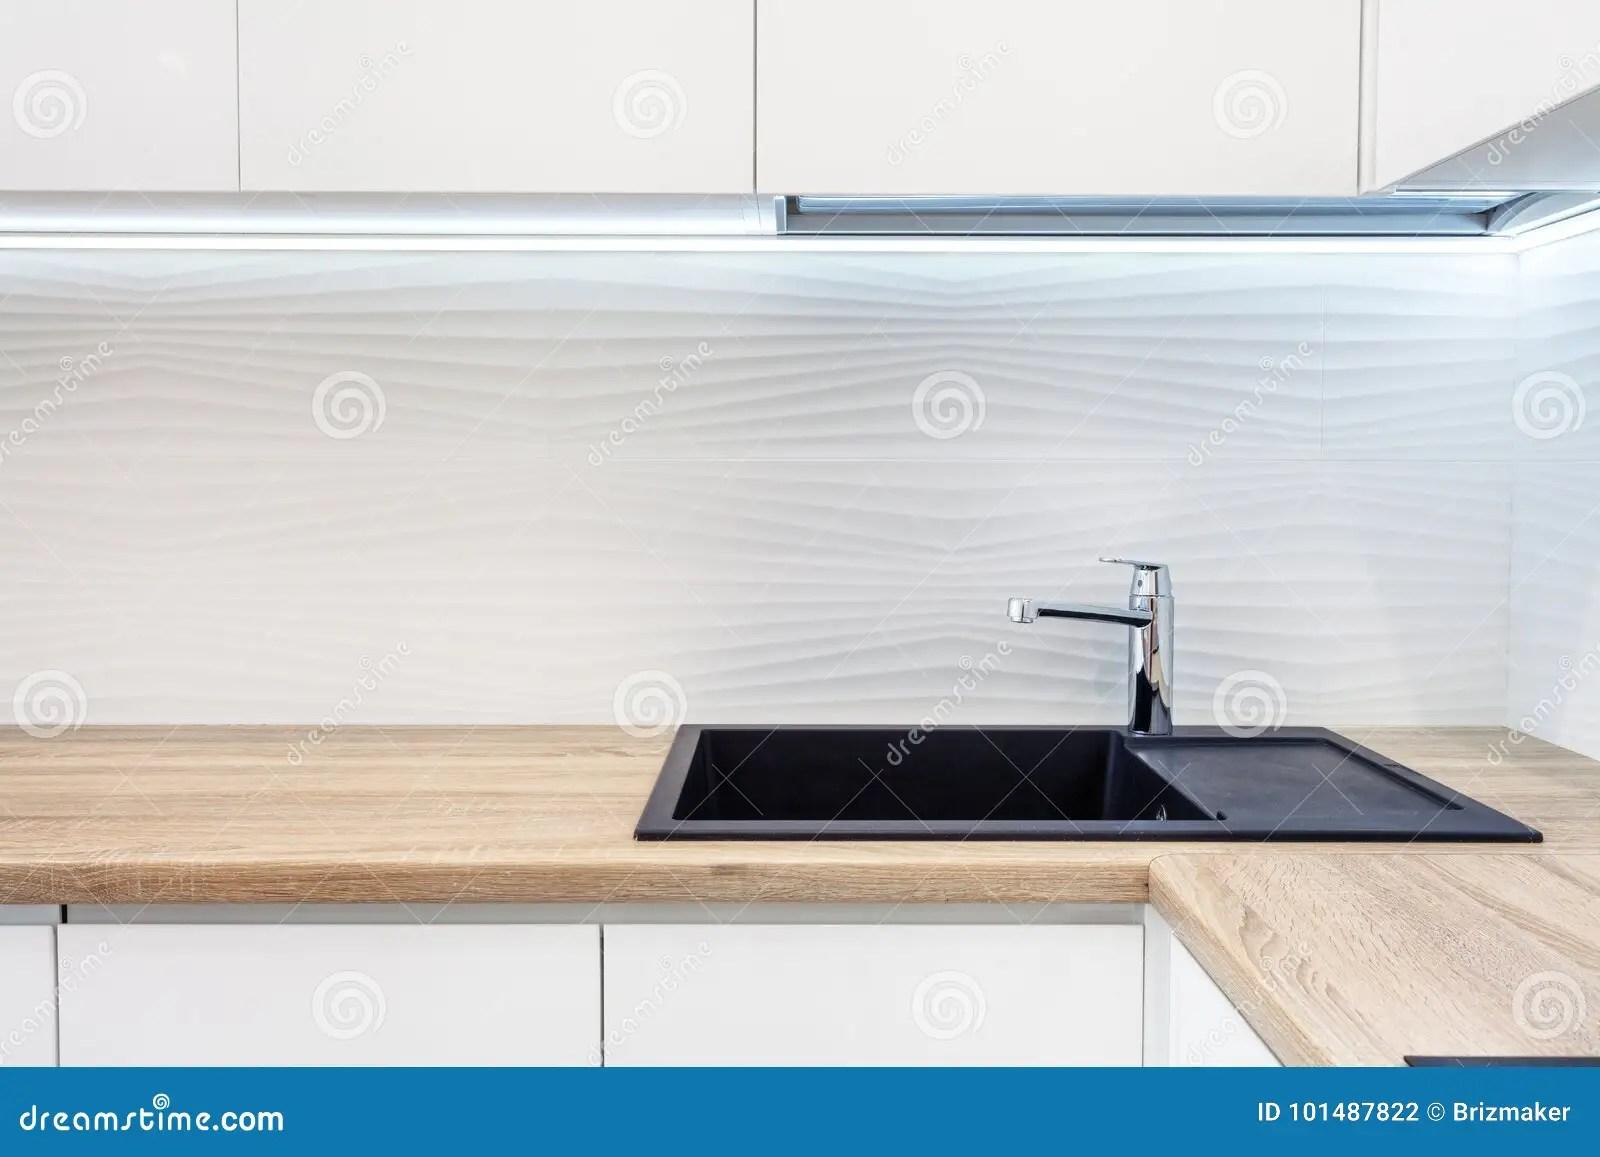 new kitchen sink cabinets colors 在黑新的厨房水槽的现代设计师镀铬物水龙头厨房表面的操作范围由木头制成 在黑新的厨房水槽的现代设计师镀铬物水龙头厨房表面的